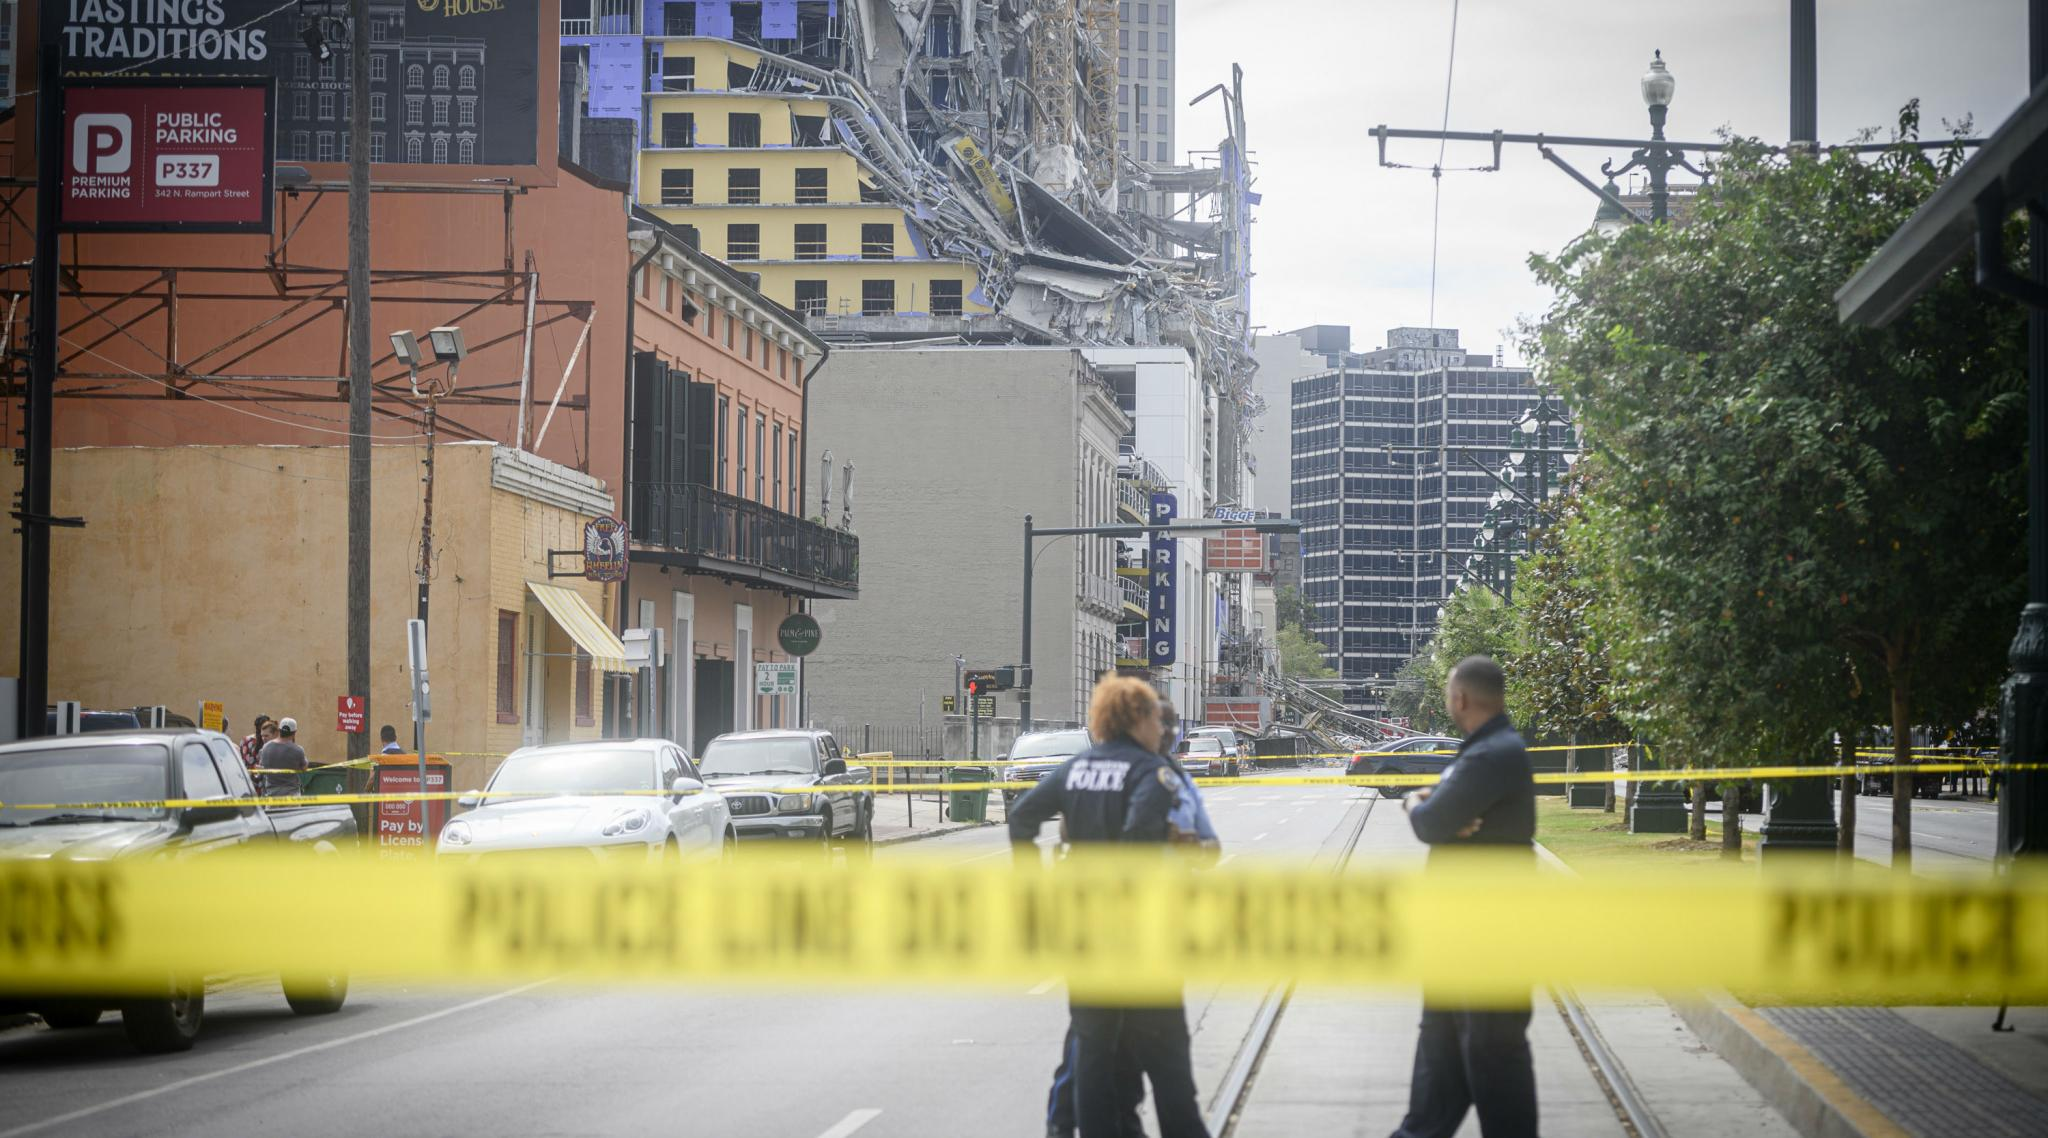 Shooting in Salt Lake City, Four Killed; Suspect in Custody